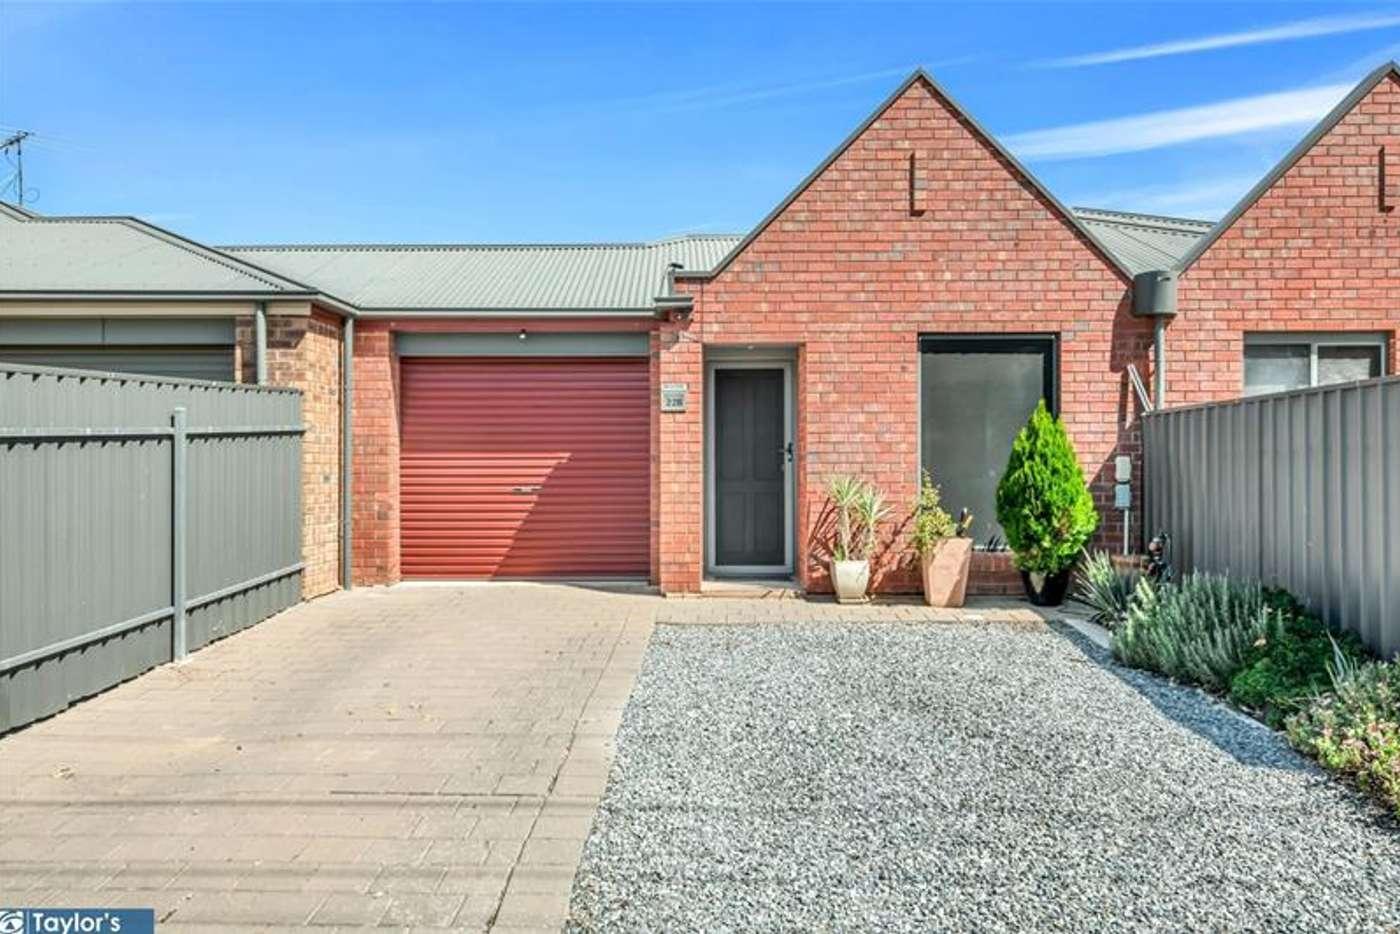 Main view of Homely house listing, 22B Harcourt Terrace, Salisbury North SA 5108